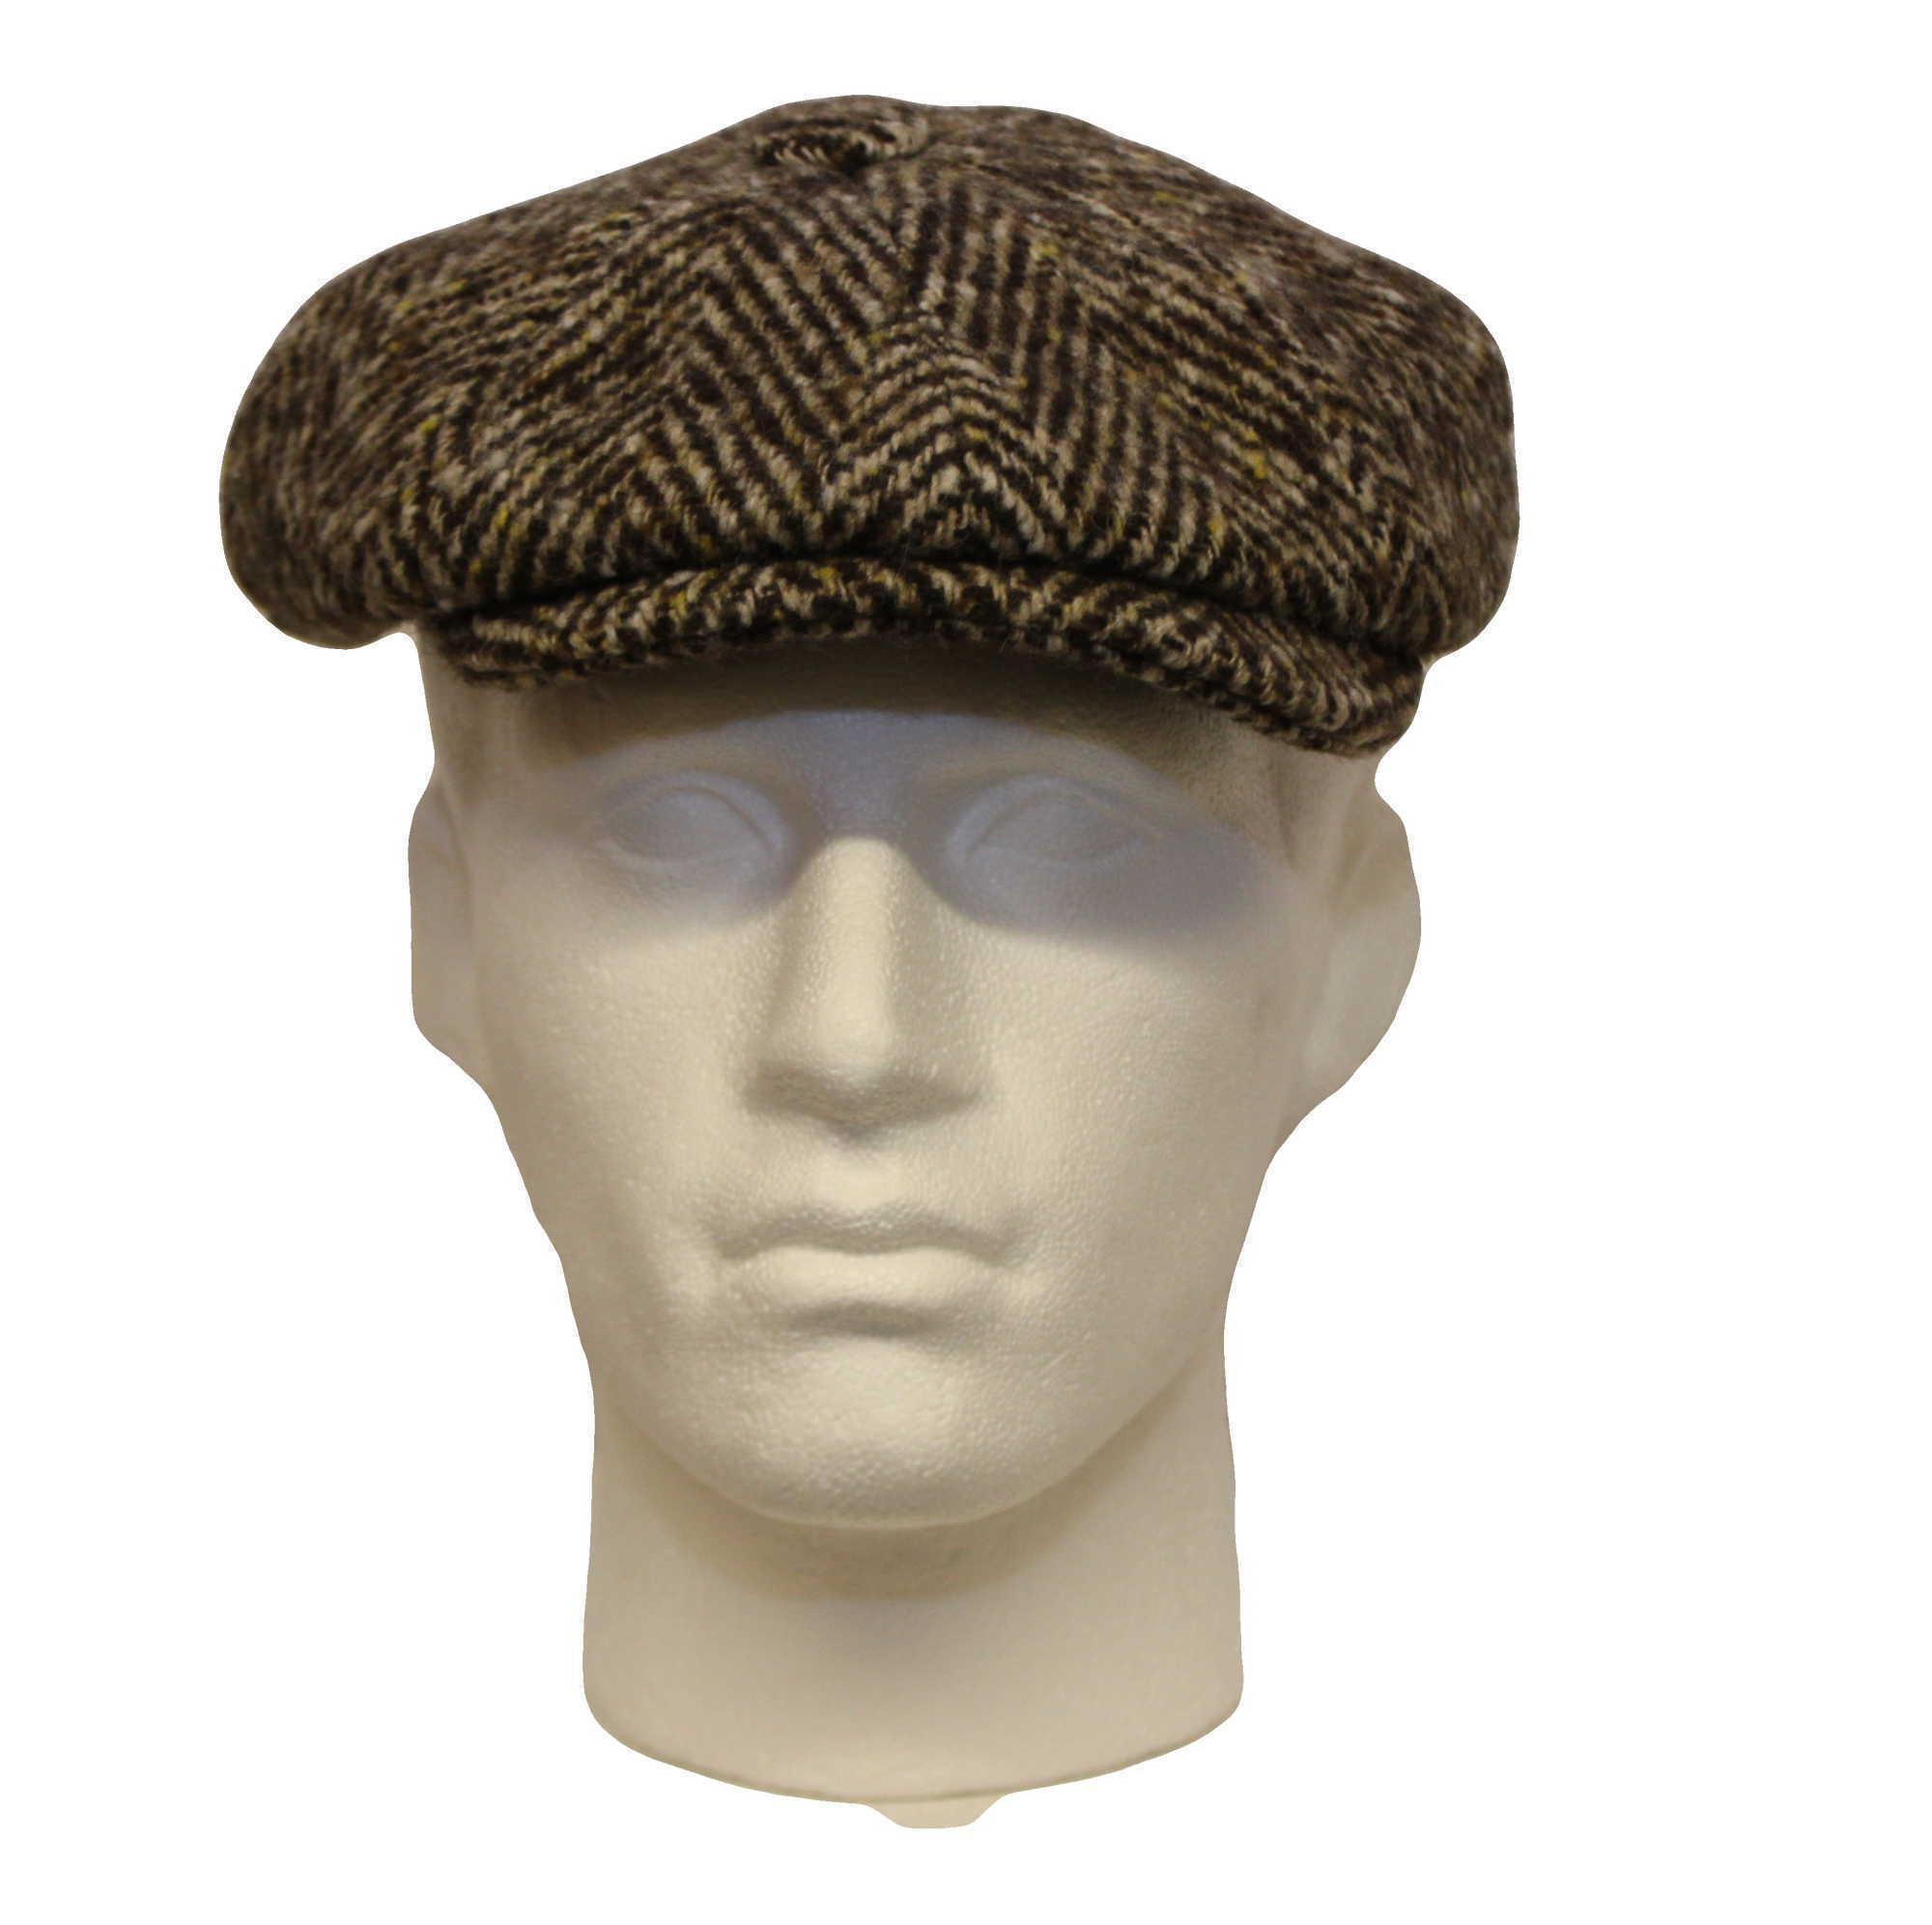 Olney Urban Chunky Herringbone Tweed Newsboy Cap Urban4